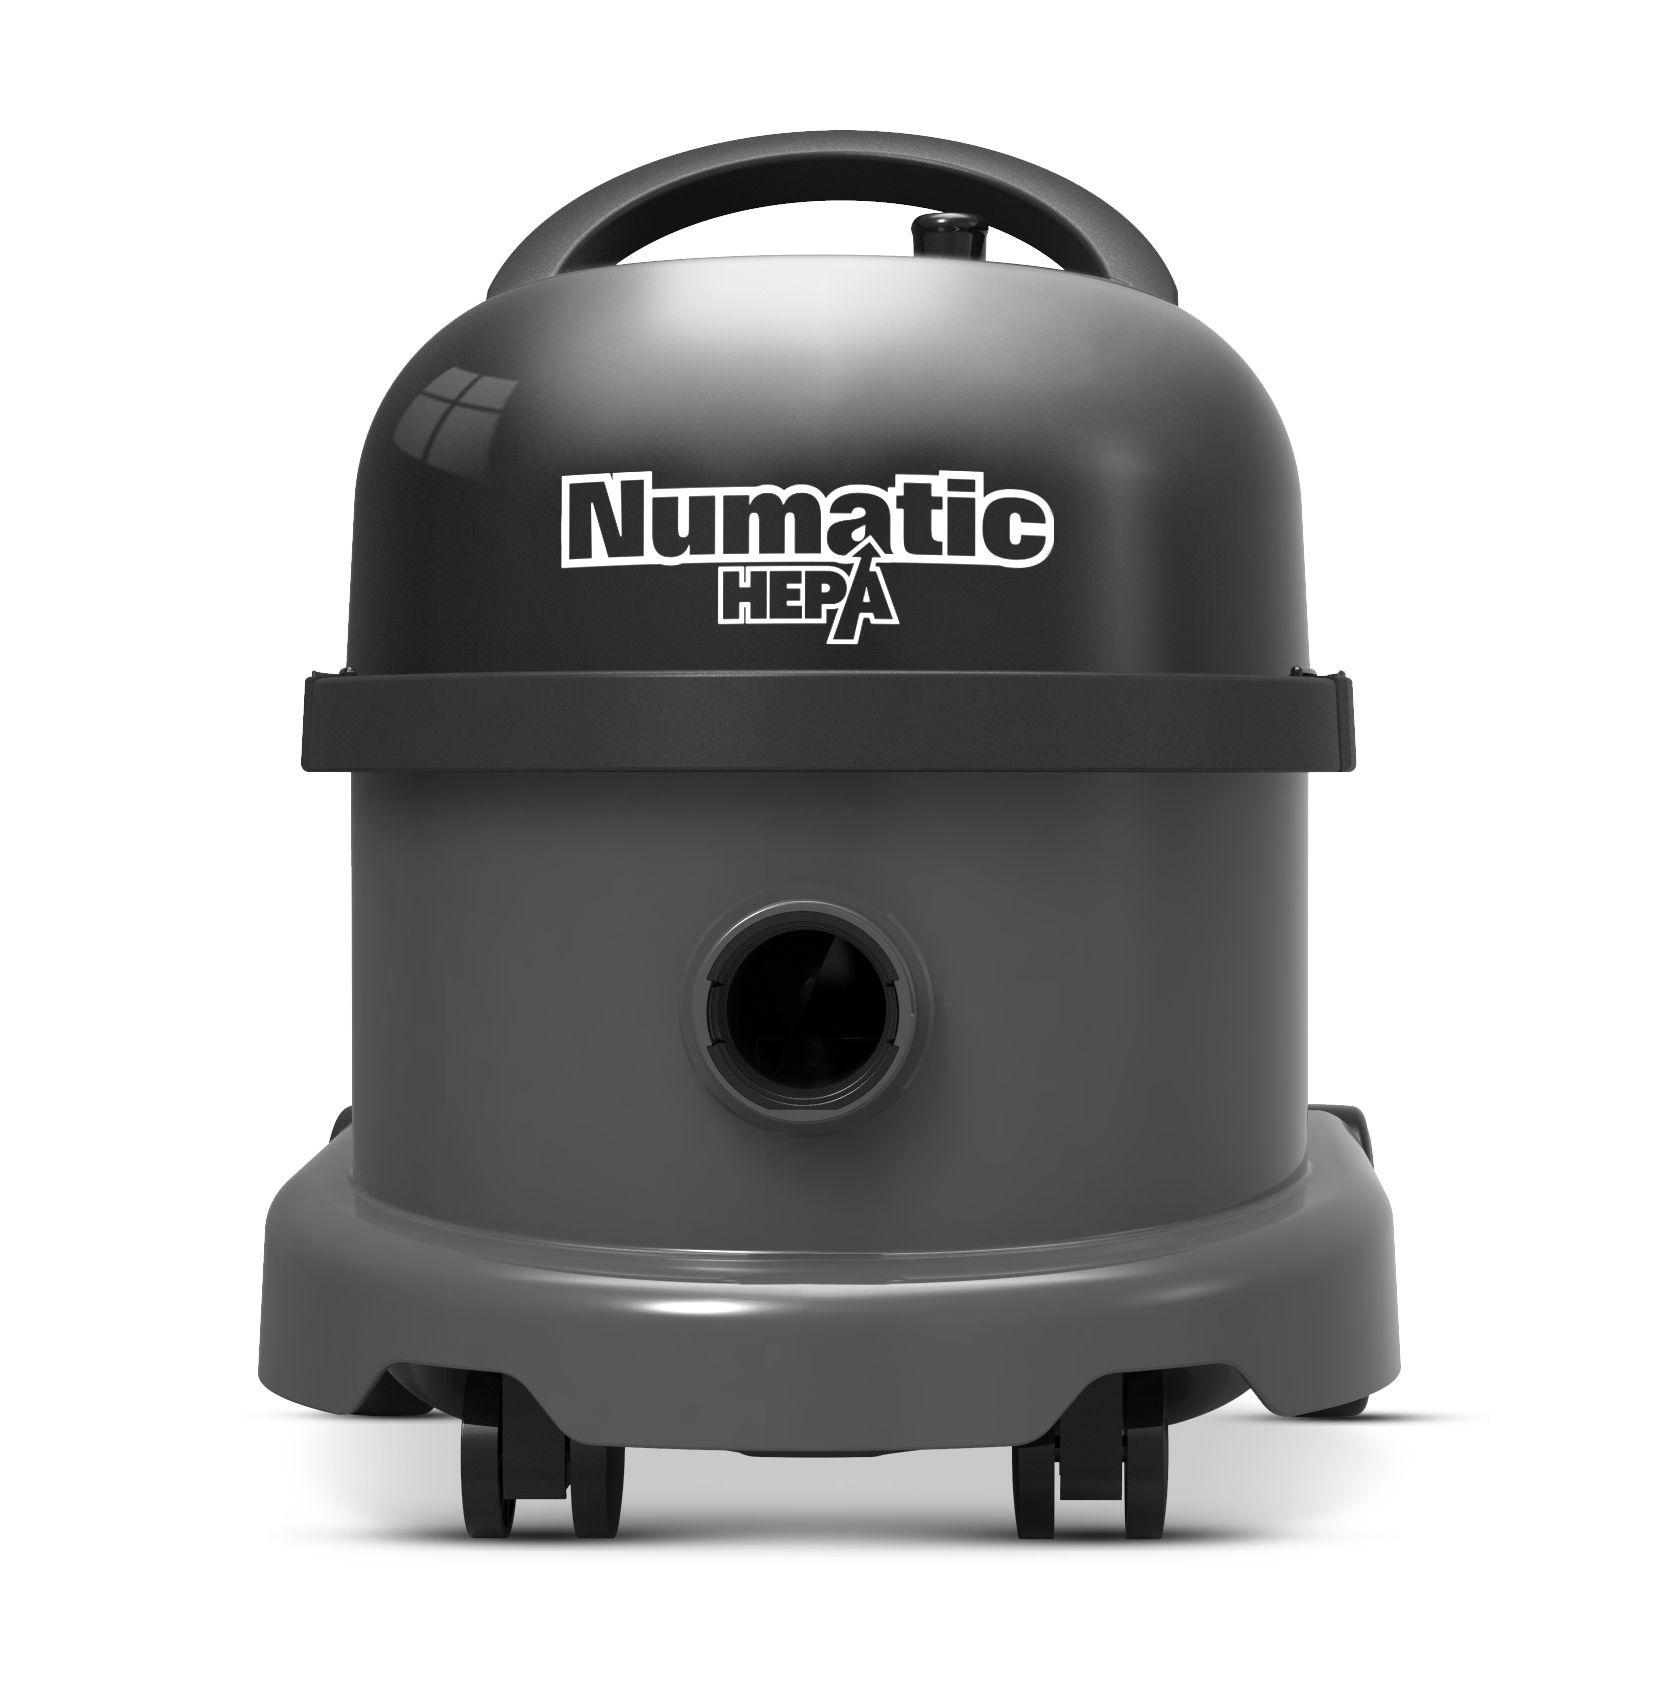 HEPA aspirateur NVR170-11 graphite avec kit AS32